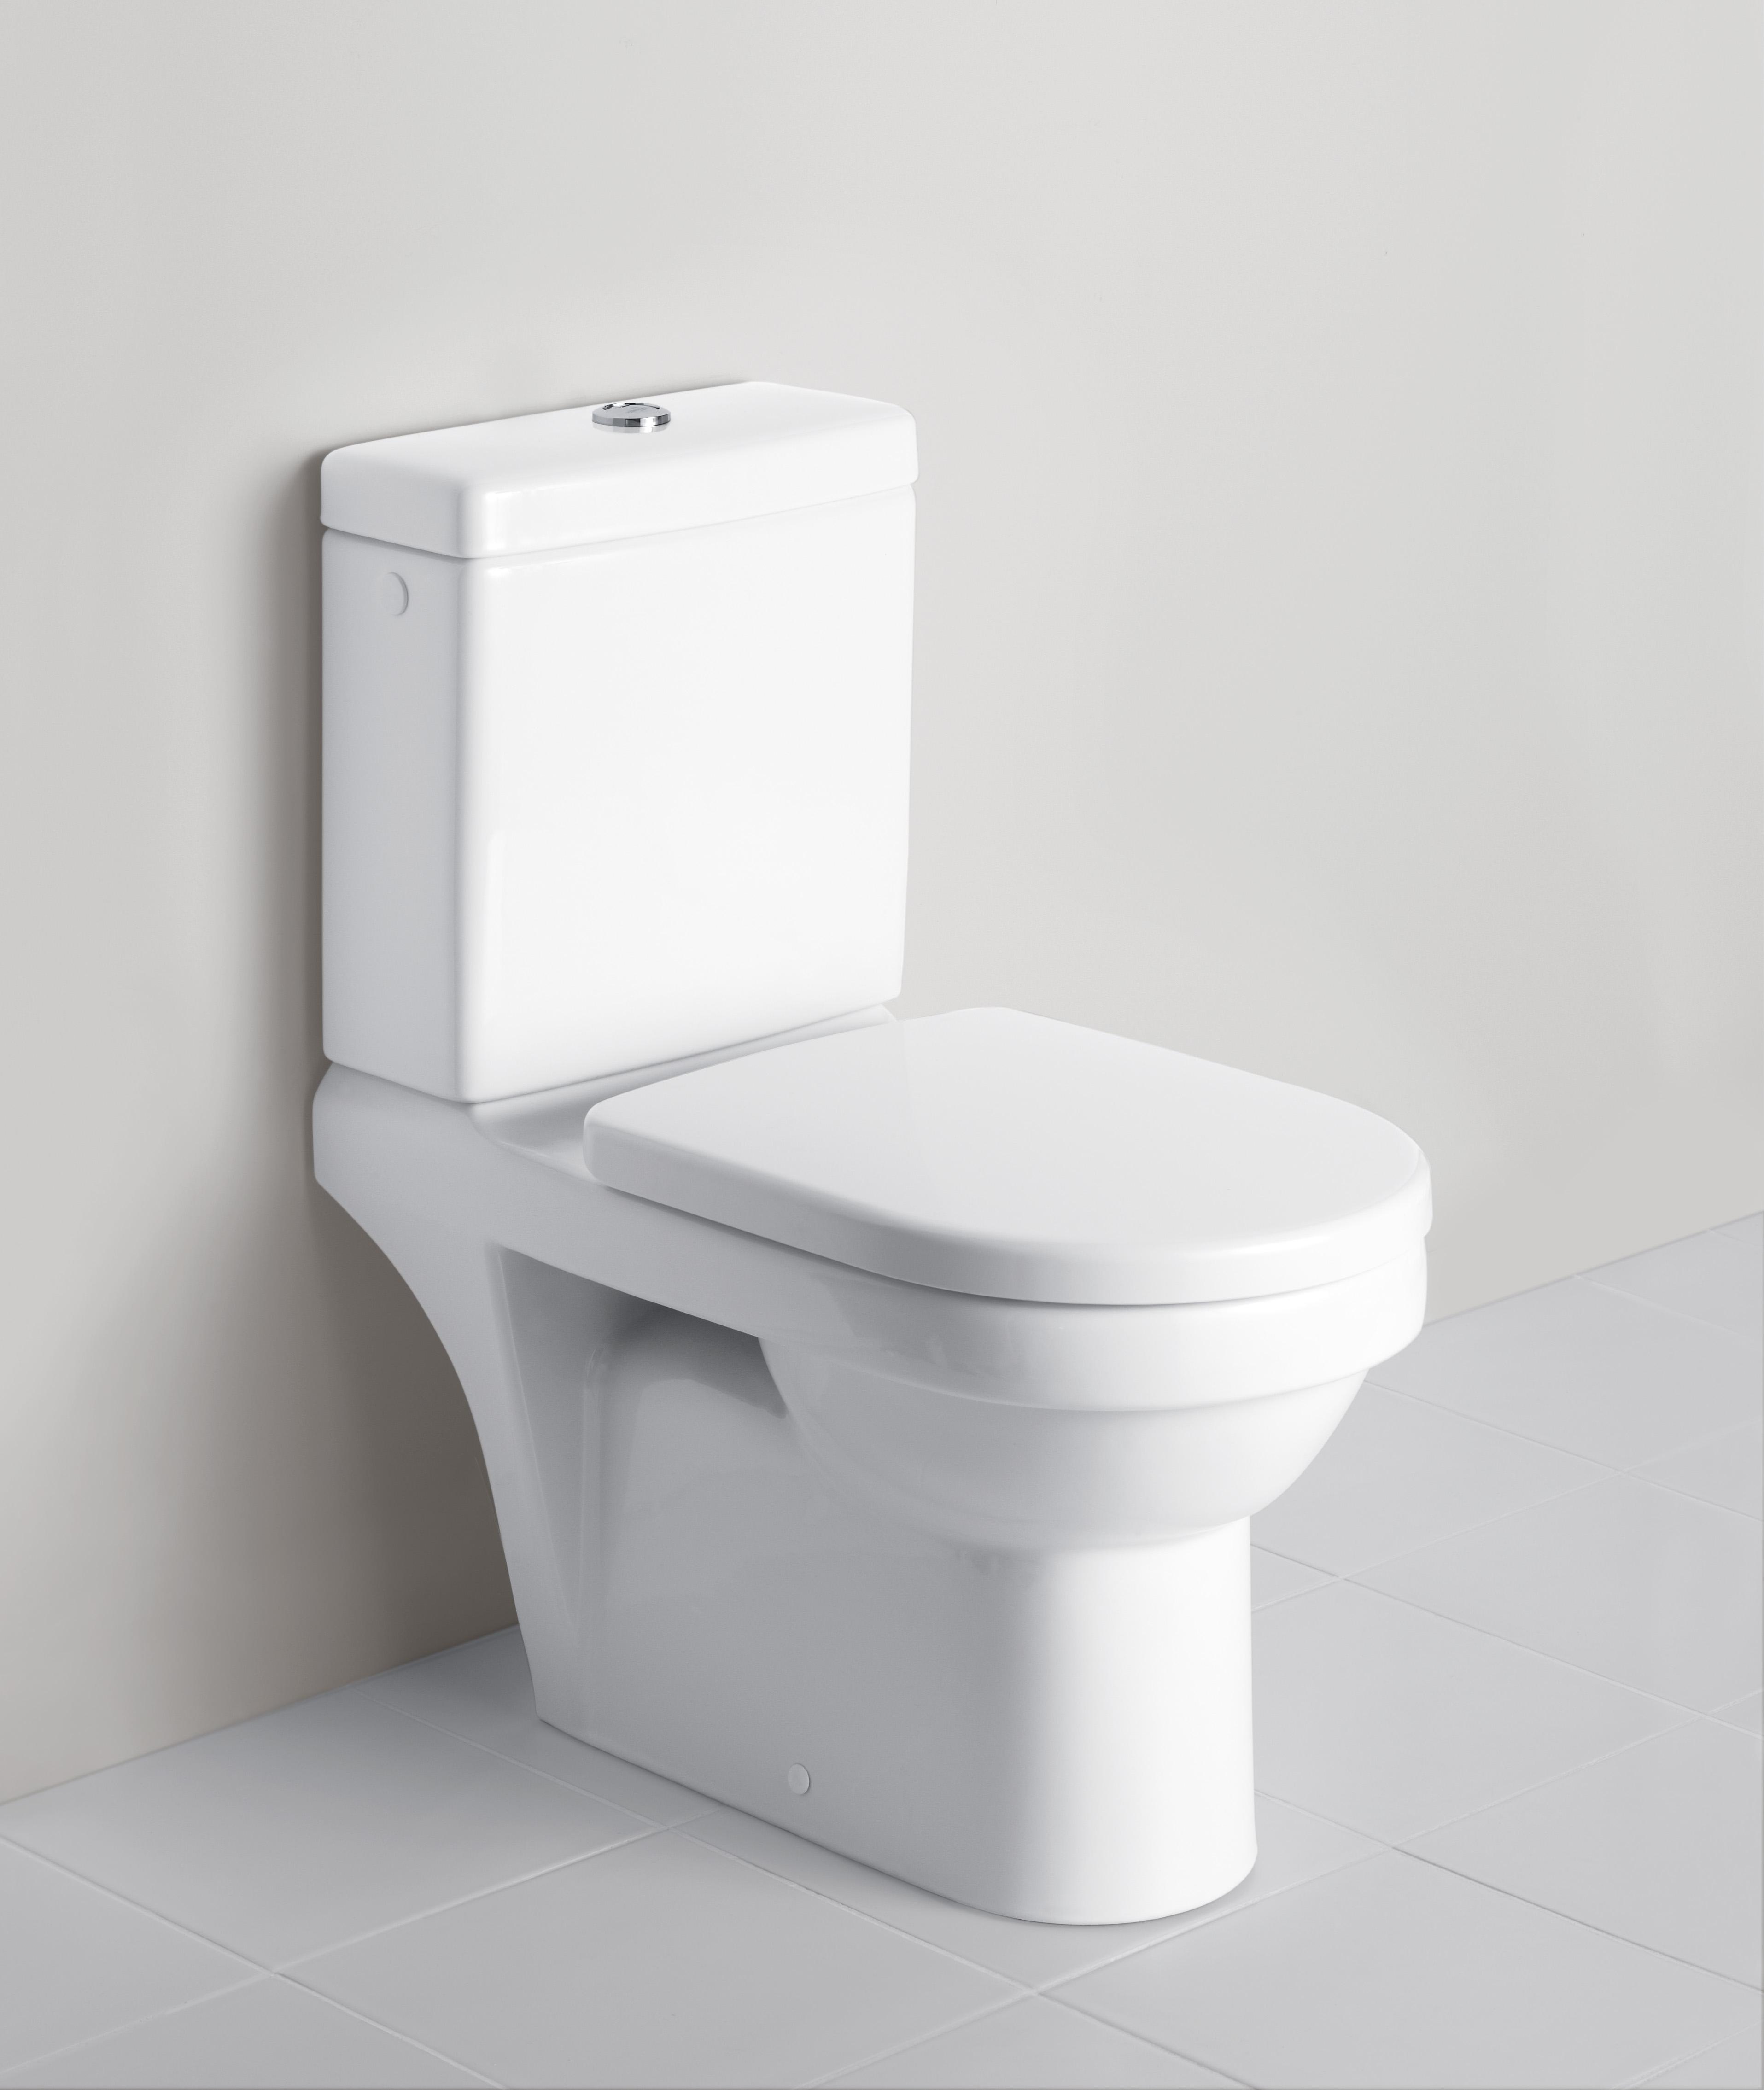 Architectura WC, WC-Sitze, WC-Sitz